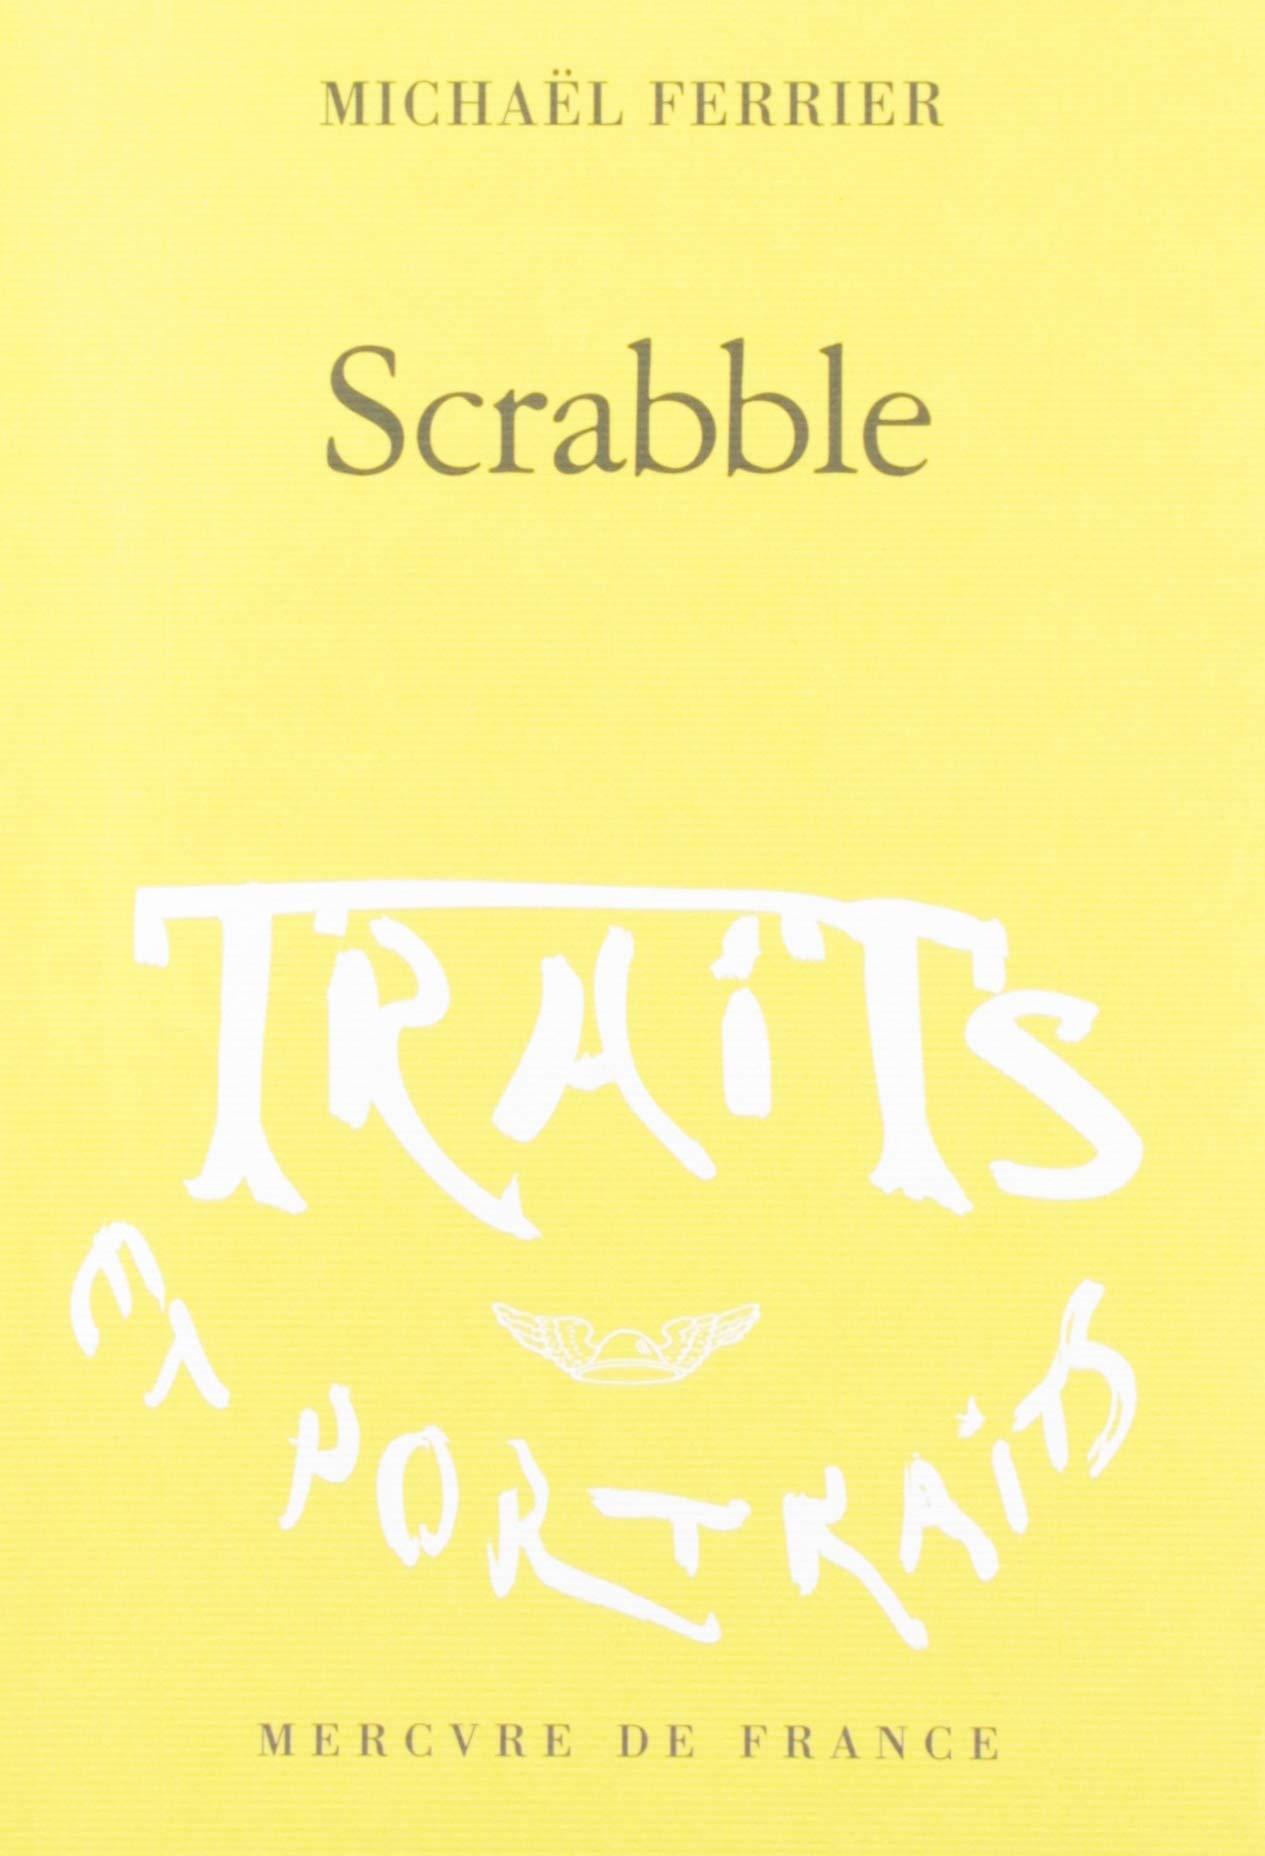 Scrabble (Traits et portraits): Amazon.es: Ferrier,Michaël: Libros en idiomas extranjeros